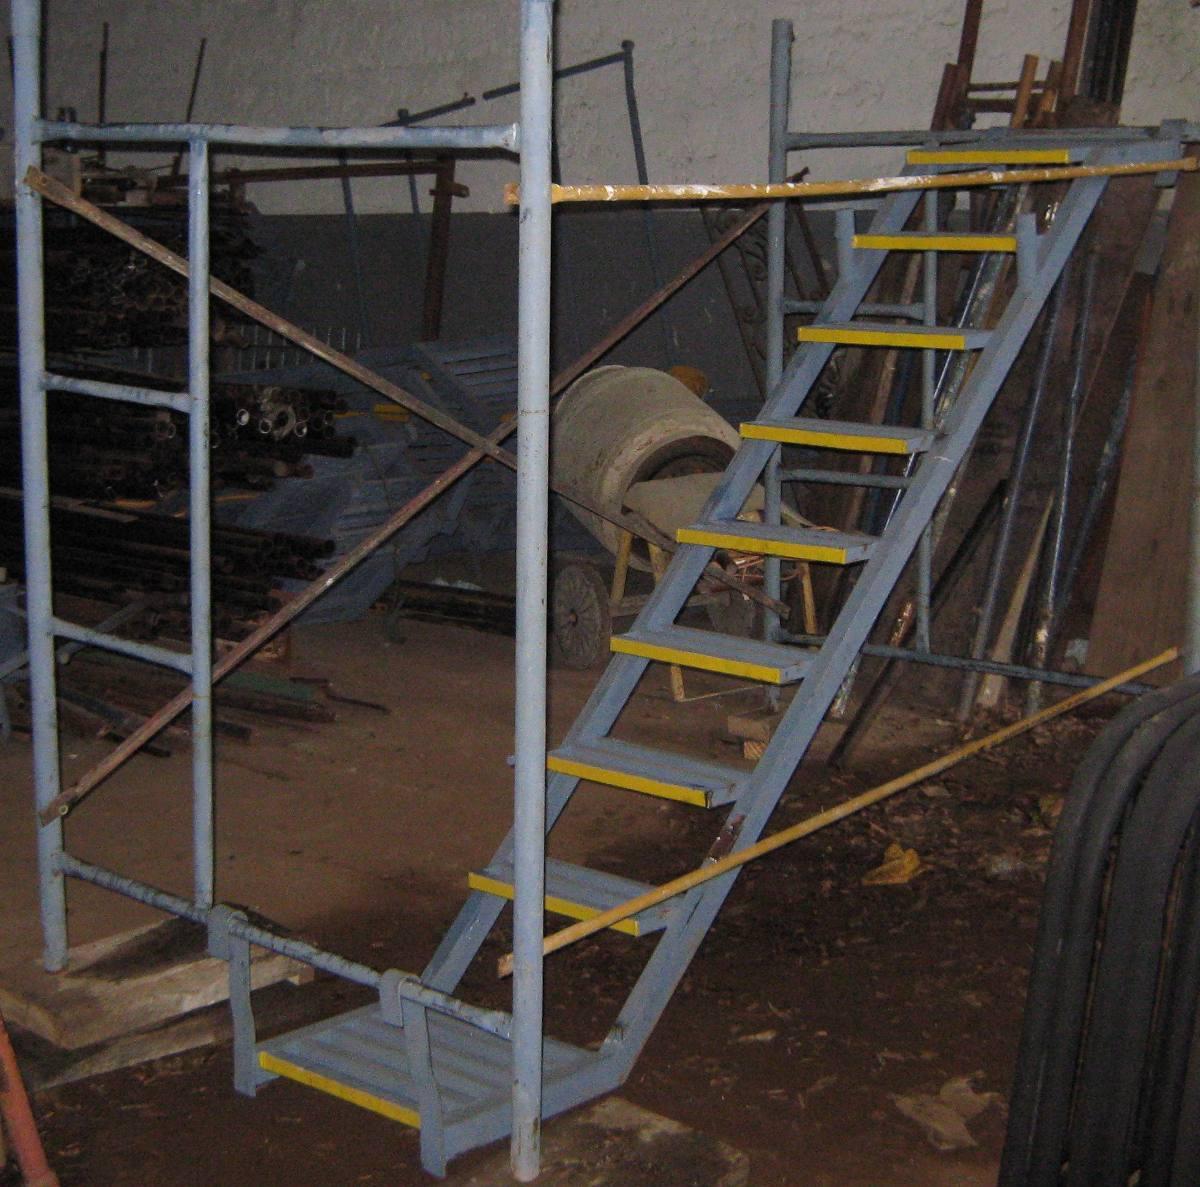 escaleras internas usadas para andamios contado o credito